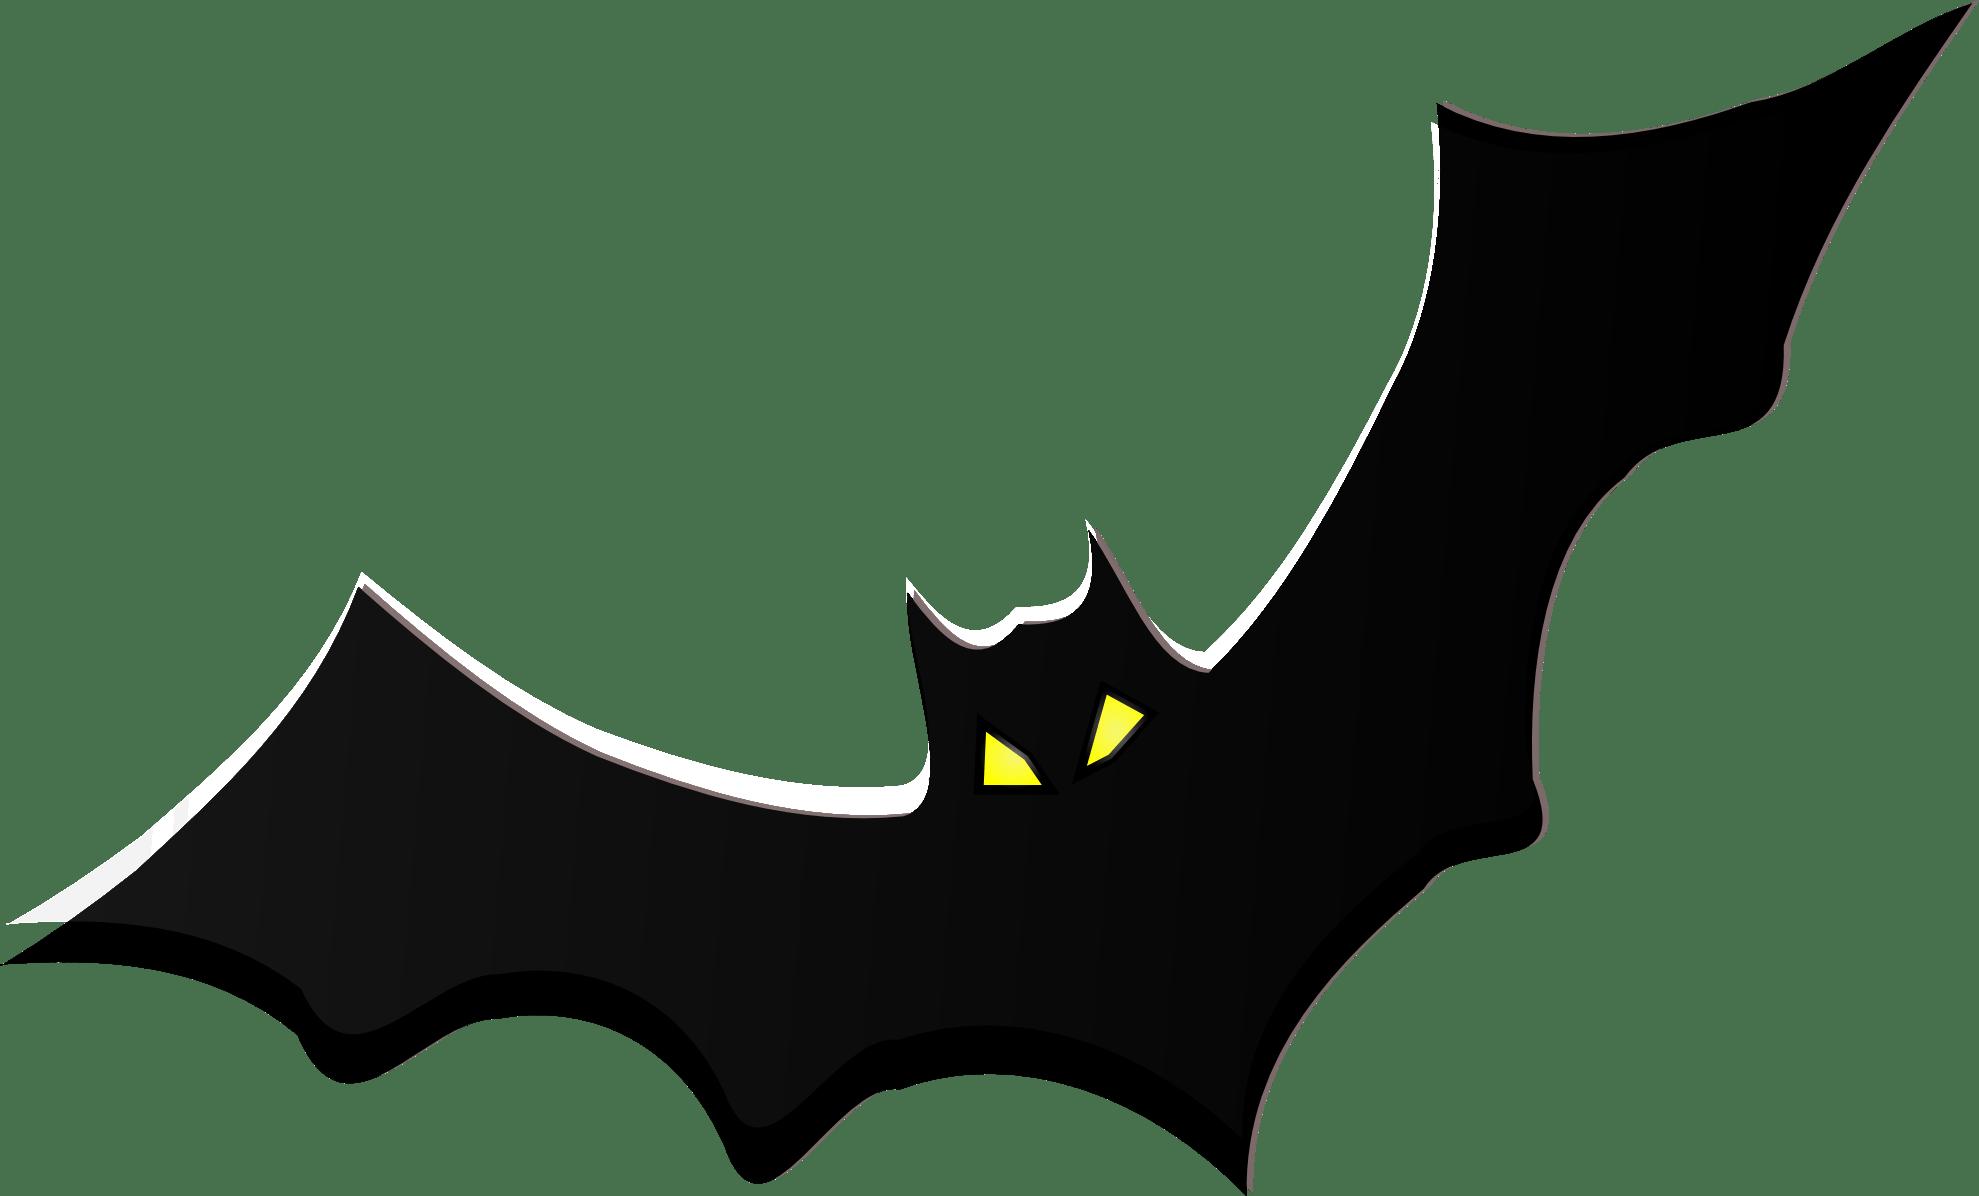 Bat transparent. Logo clipart png stickpng